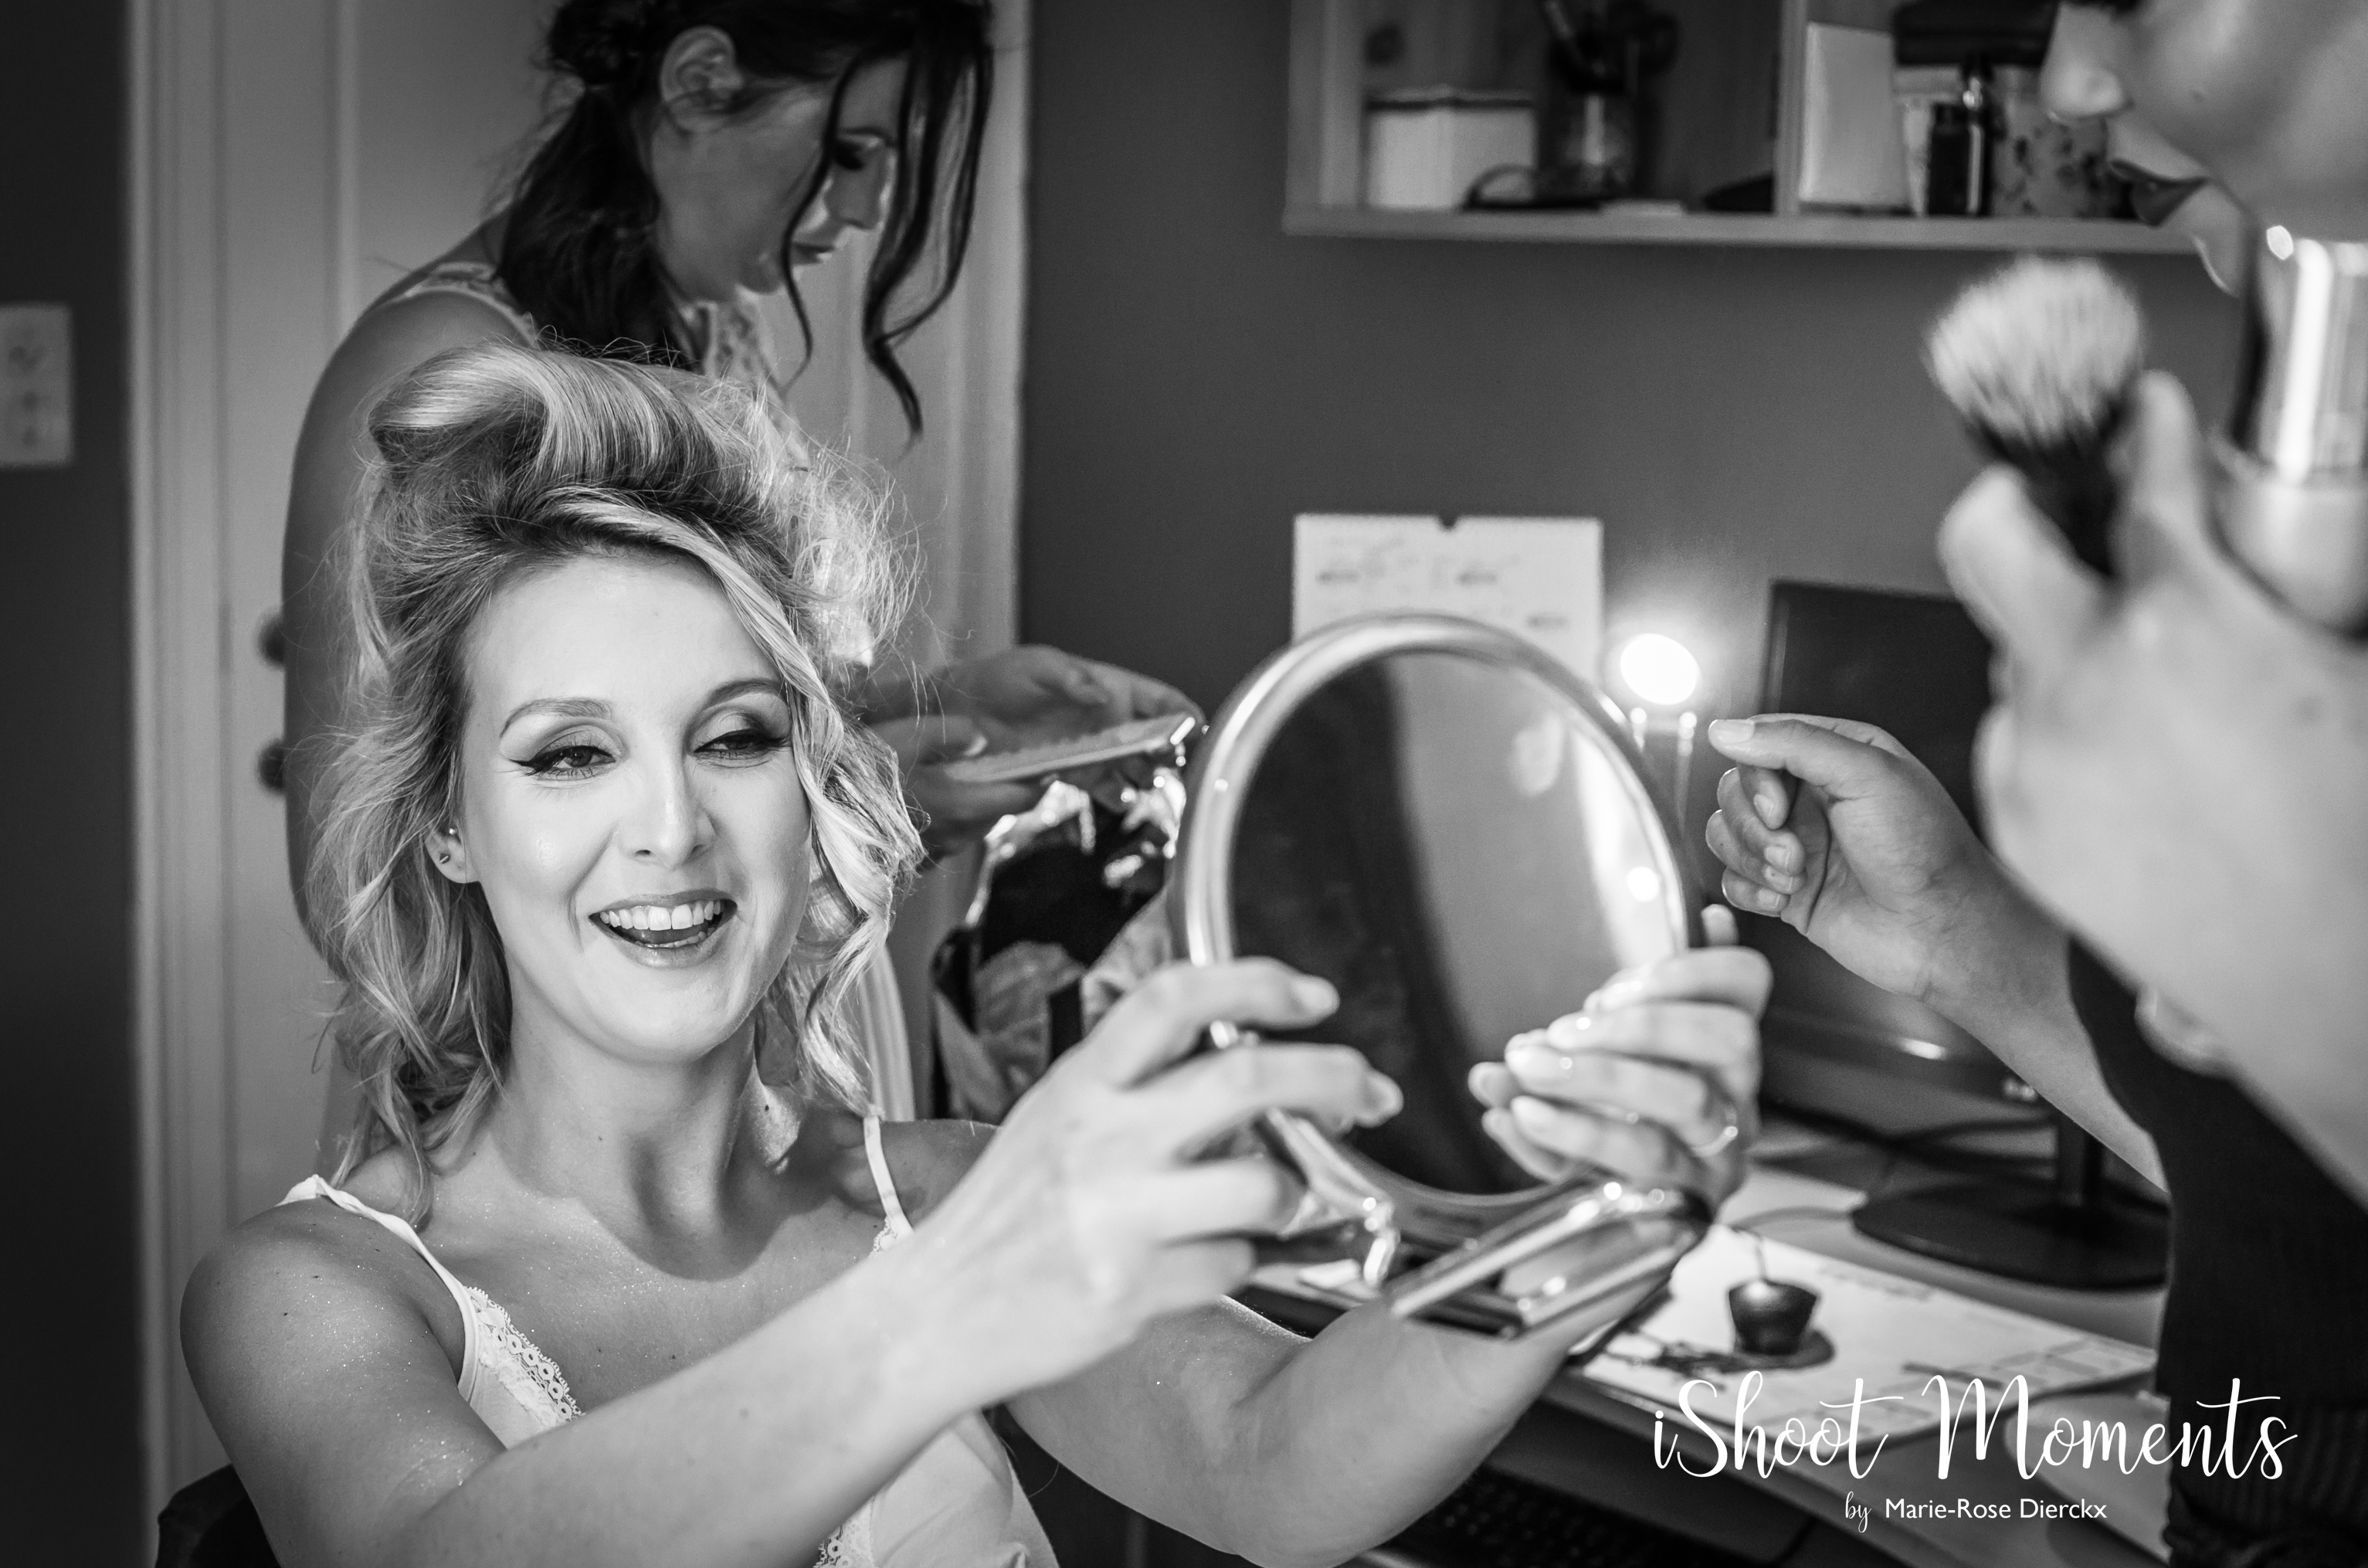 Huwelijksfotograaf, iShoot Moments